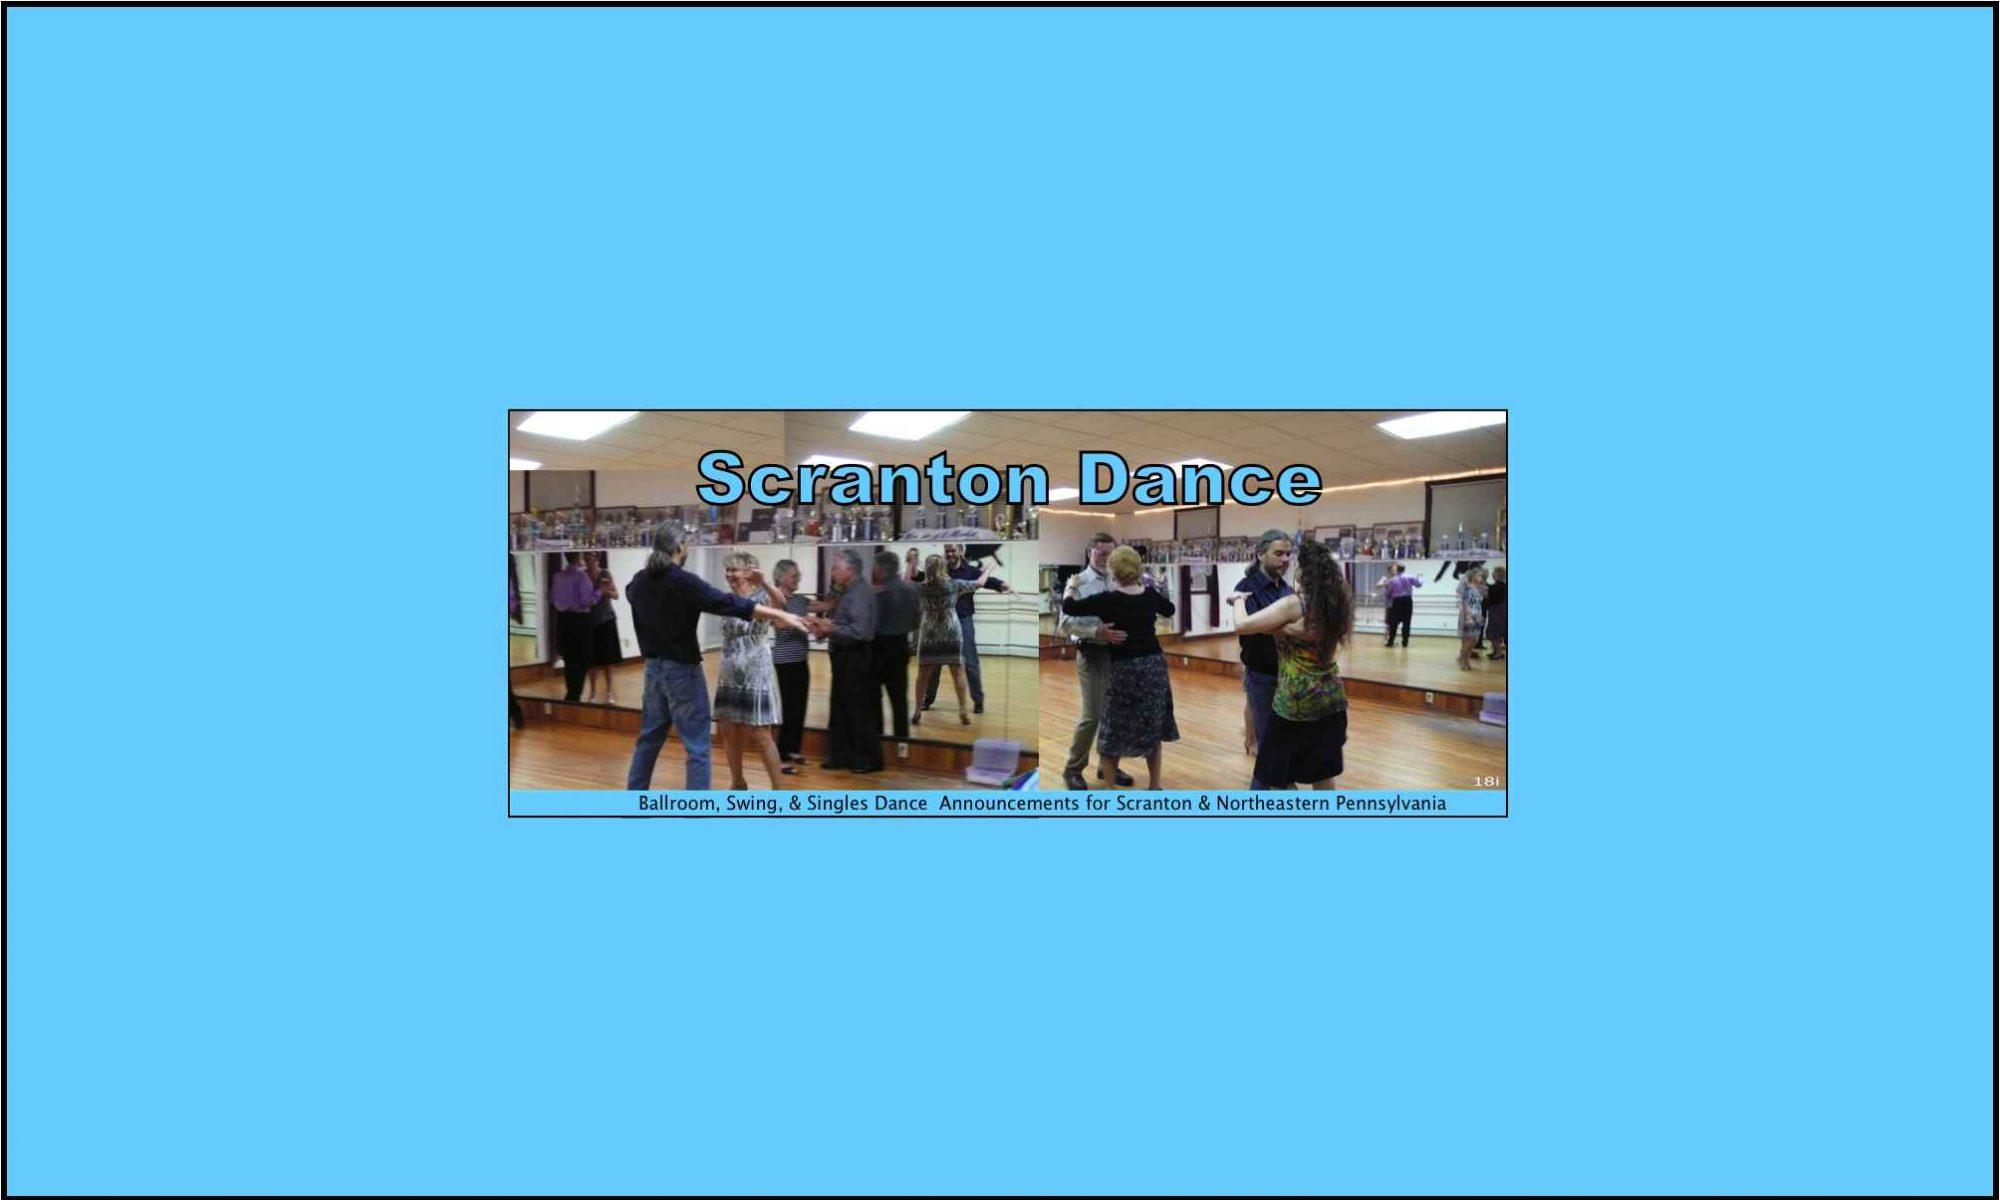 Scranton Dance